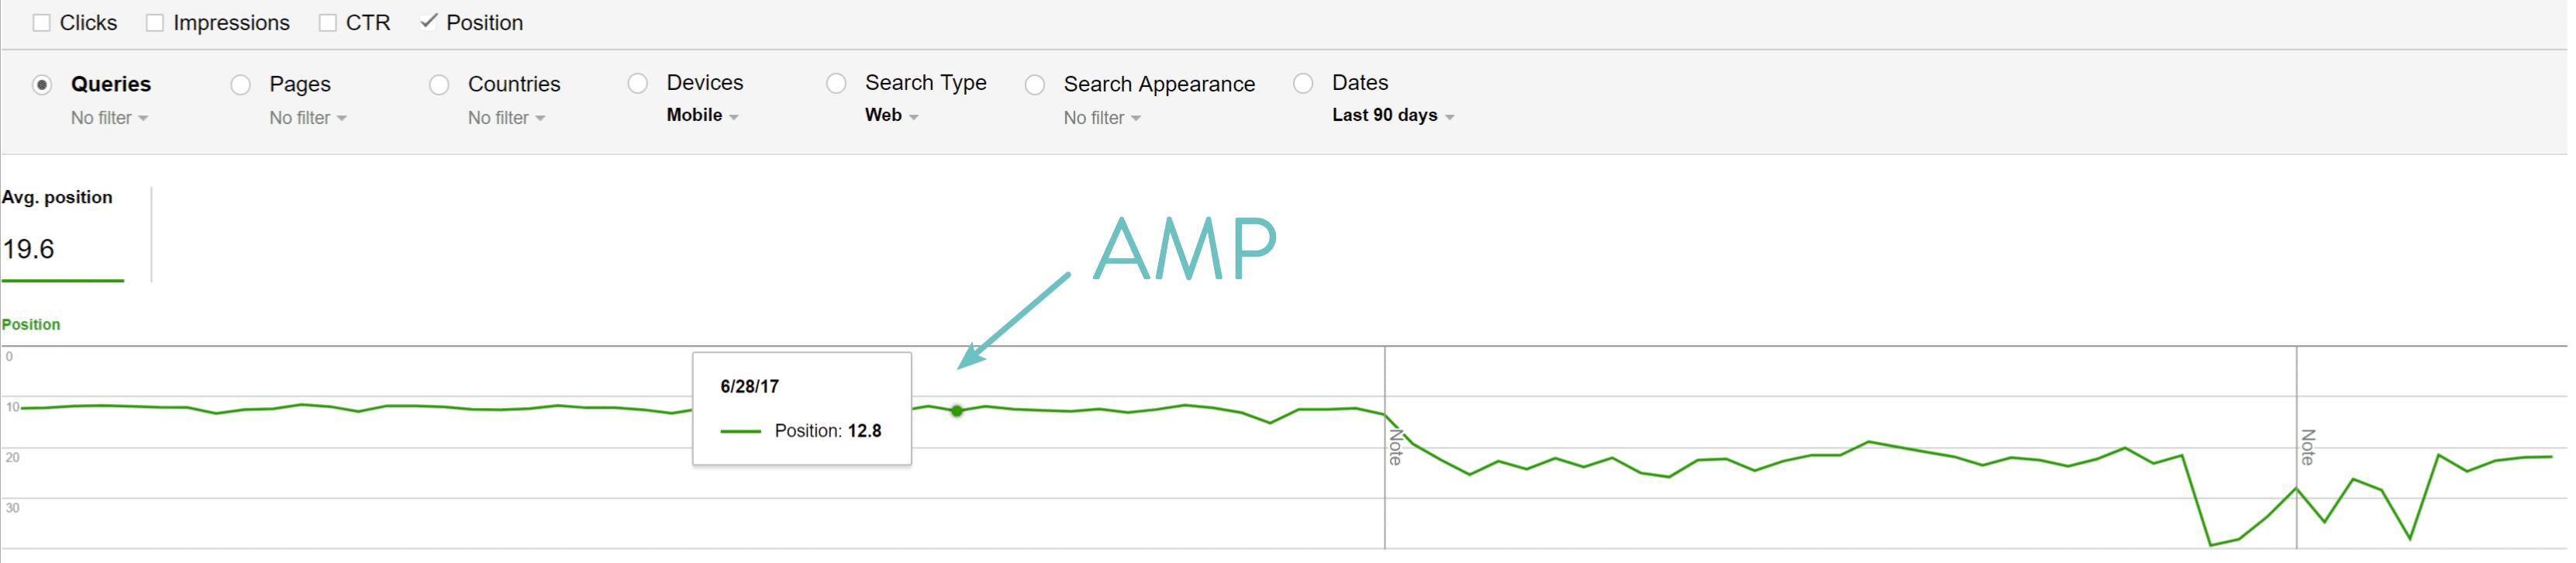 Dati posizioni Google AMP